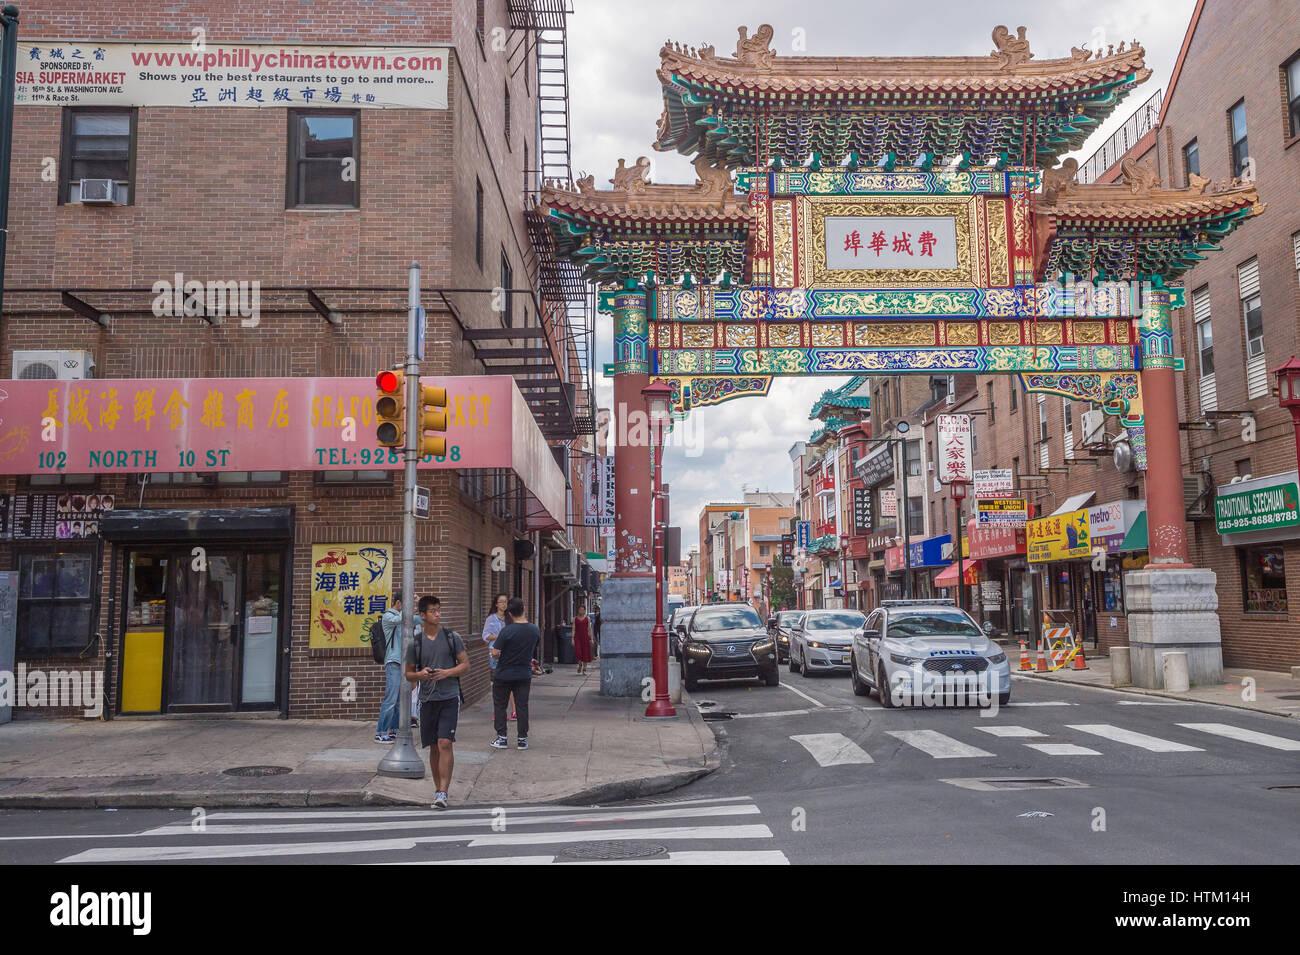 Chinese Friendship Arch Gate Chinatown Philadelphia